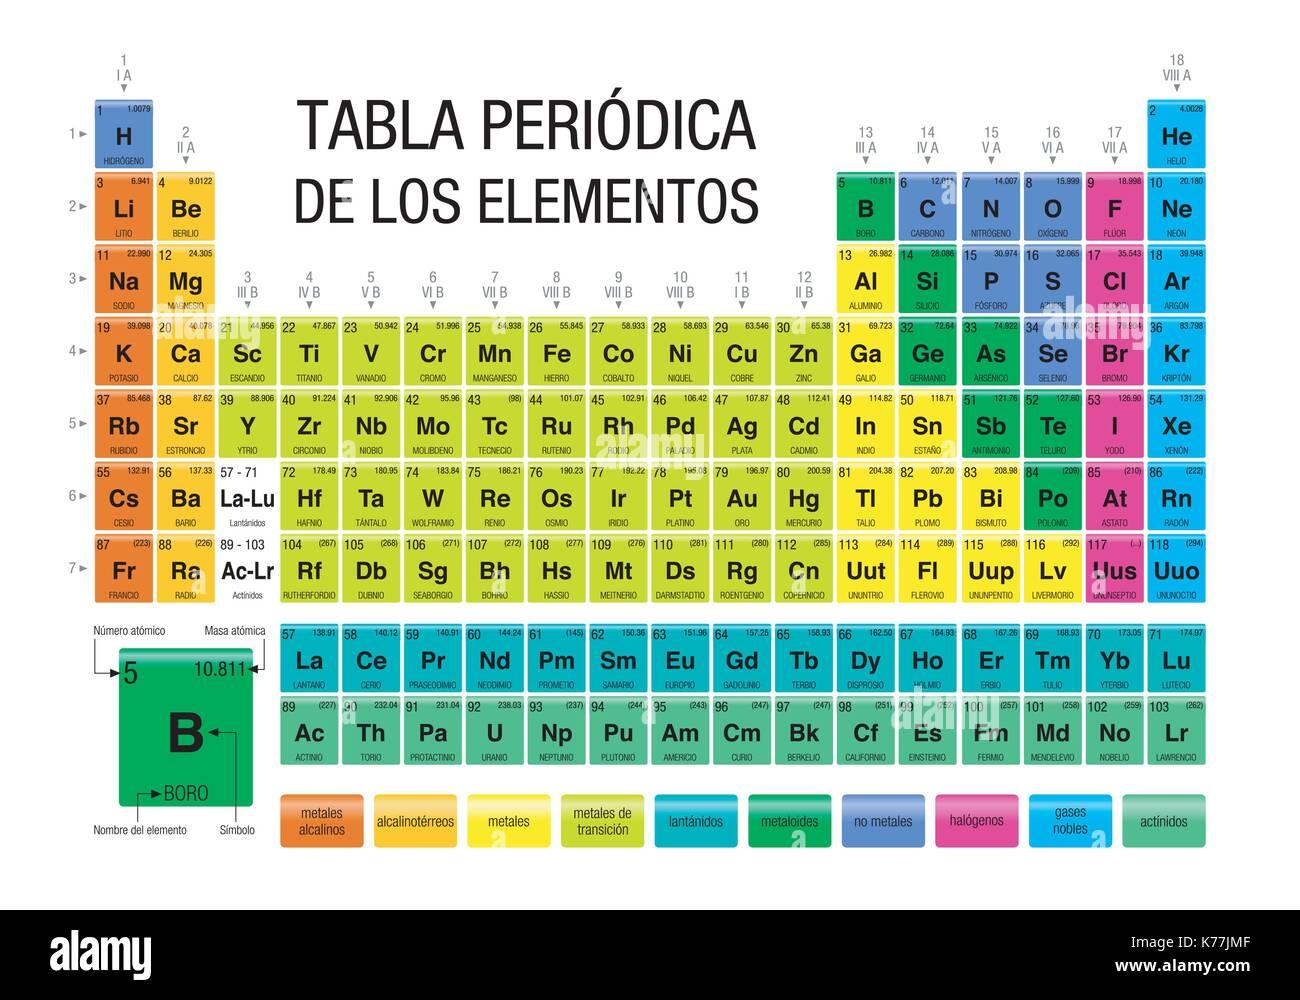 tabla periodica de los elementos periodic table of elements in spanish language chemistry - Tabla Periodica De Los Elementos I